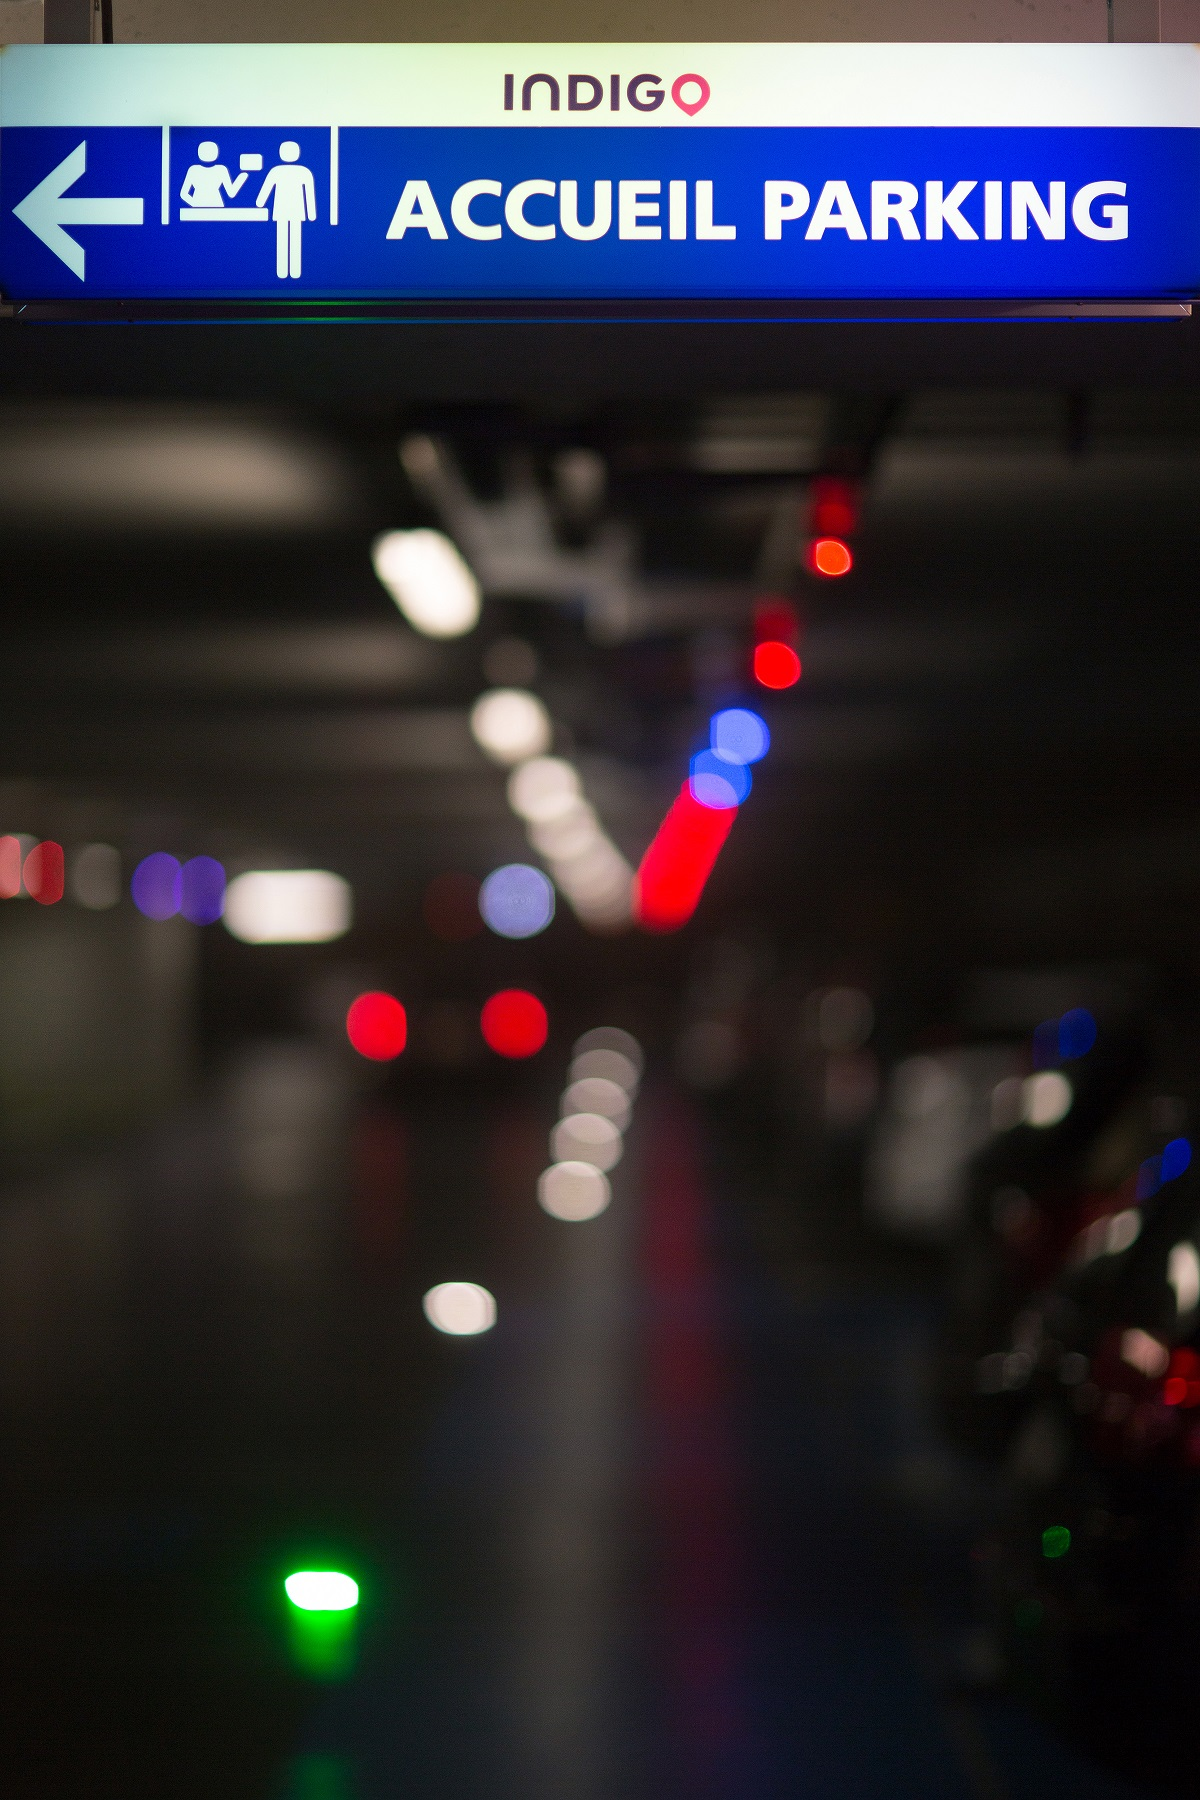 Parking Indigo Saint-Cloud Orléans